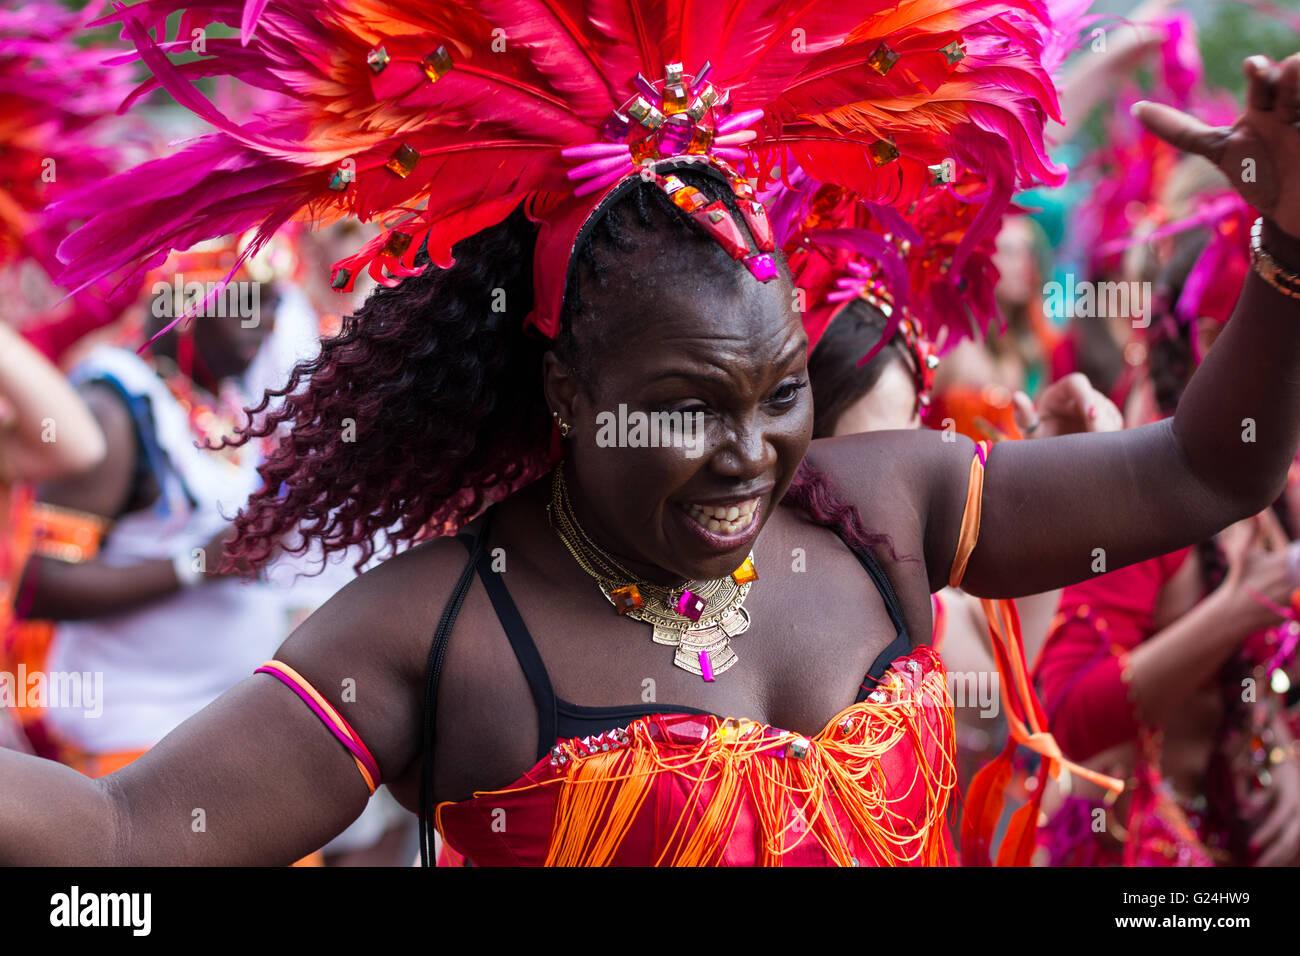 Portrait of dancing woman in costume on Carnival of Cultures (Karneval der Kulturen)  in Berlin, Germany. - Stock Image